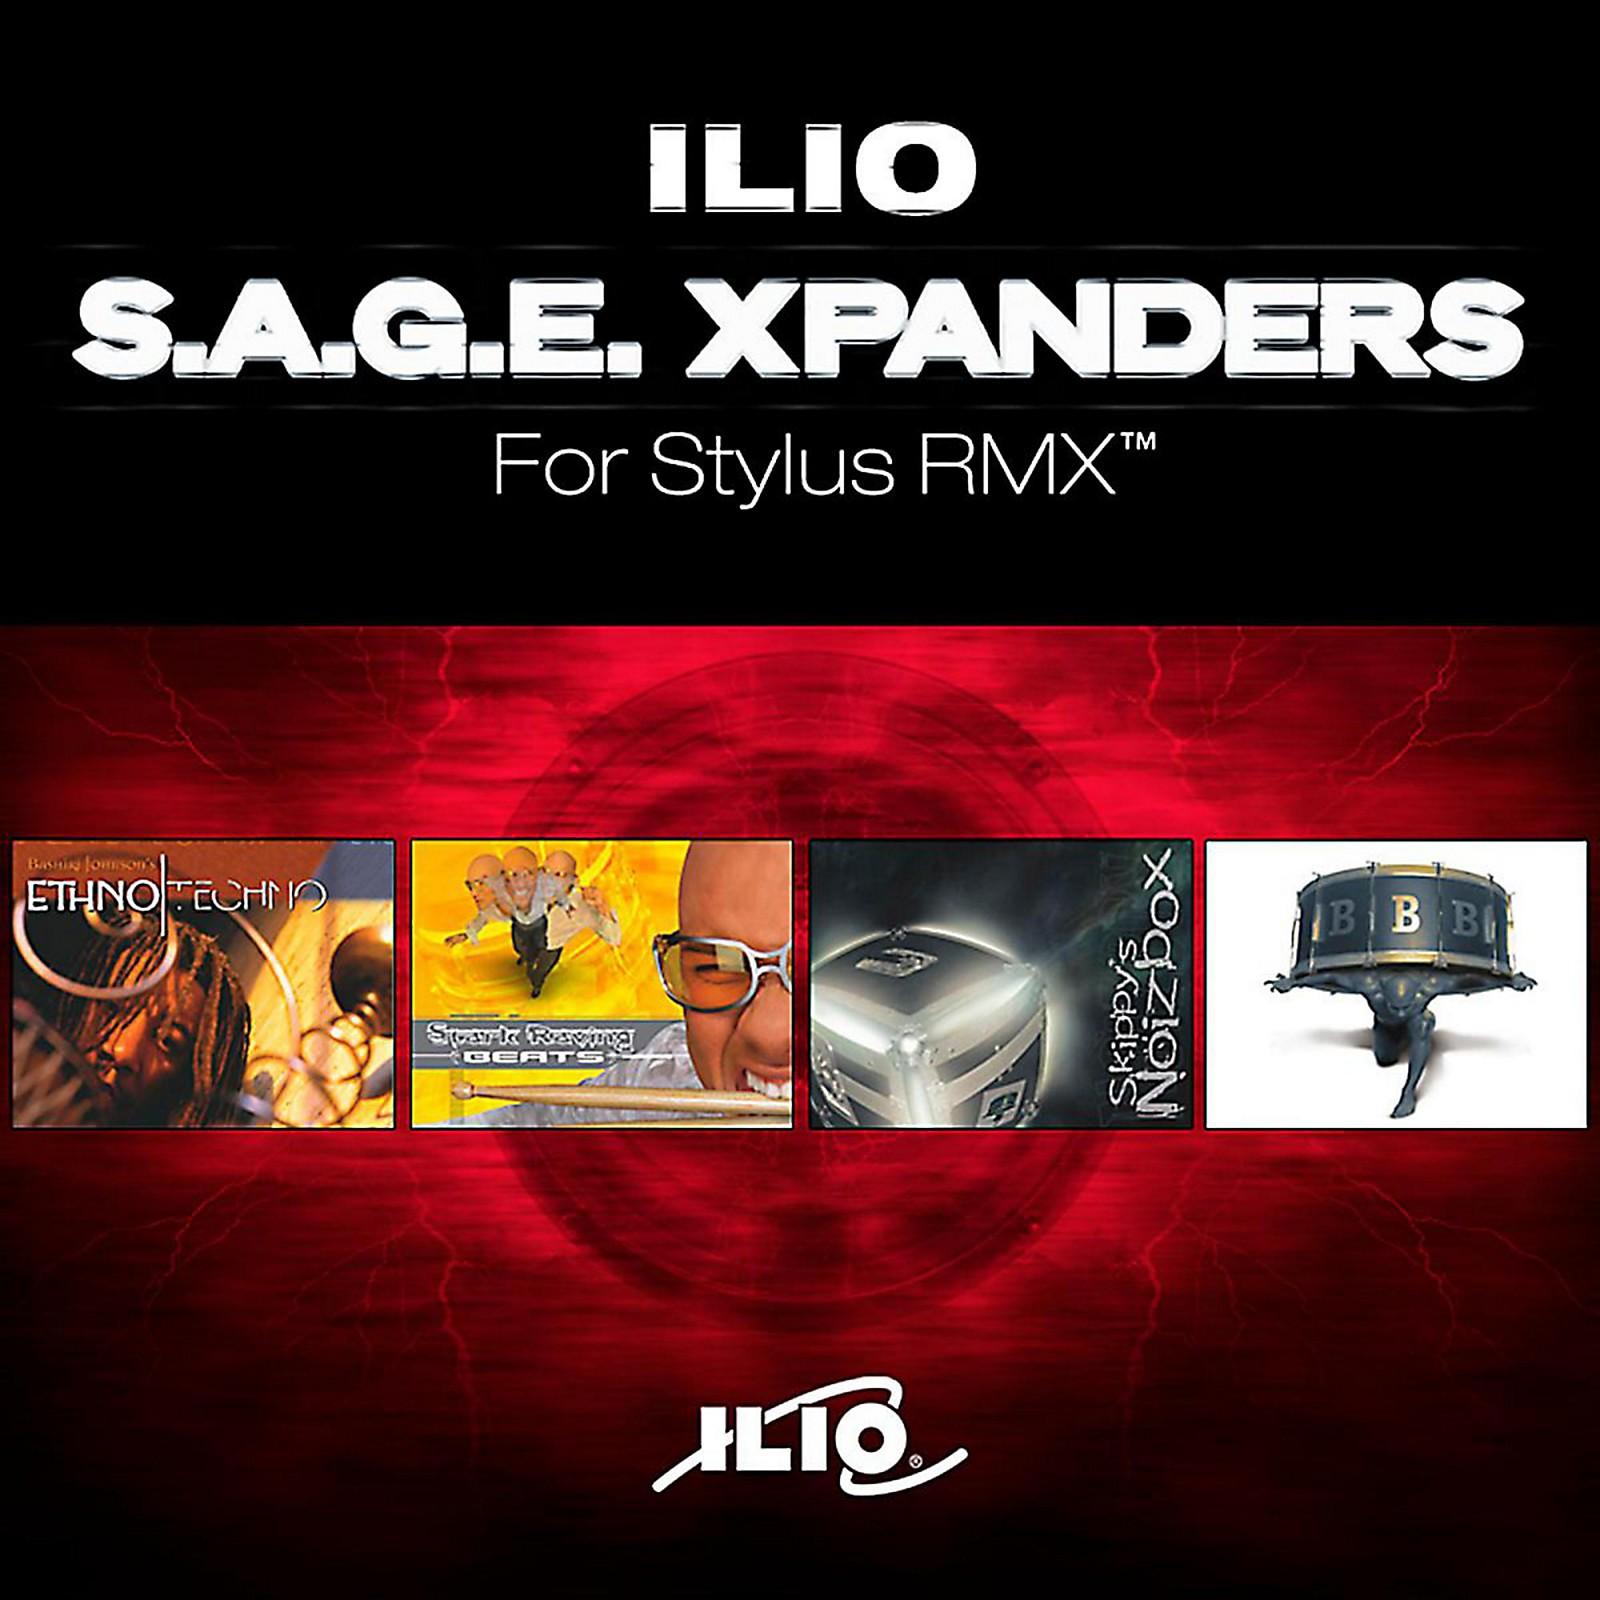 Ilio SAGE Xpander Bundle for Stylus RMX